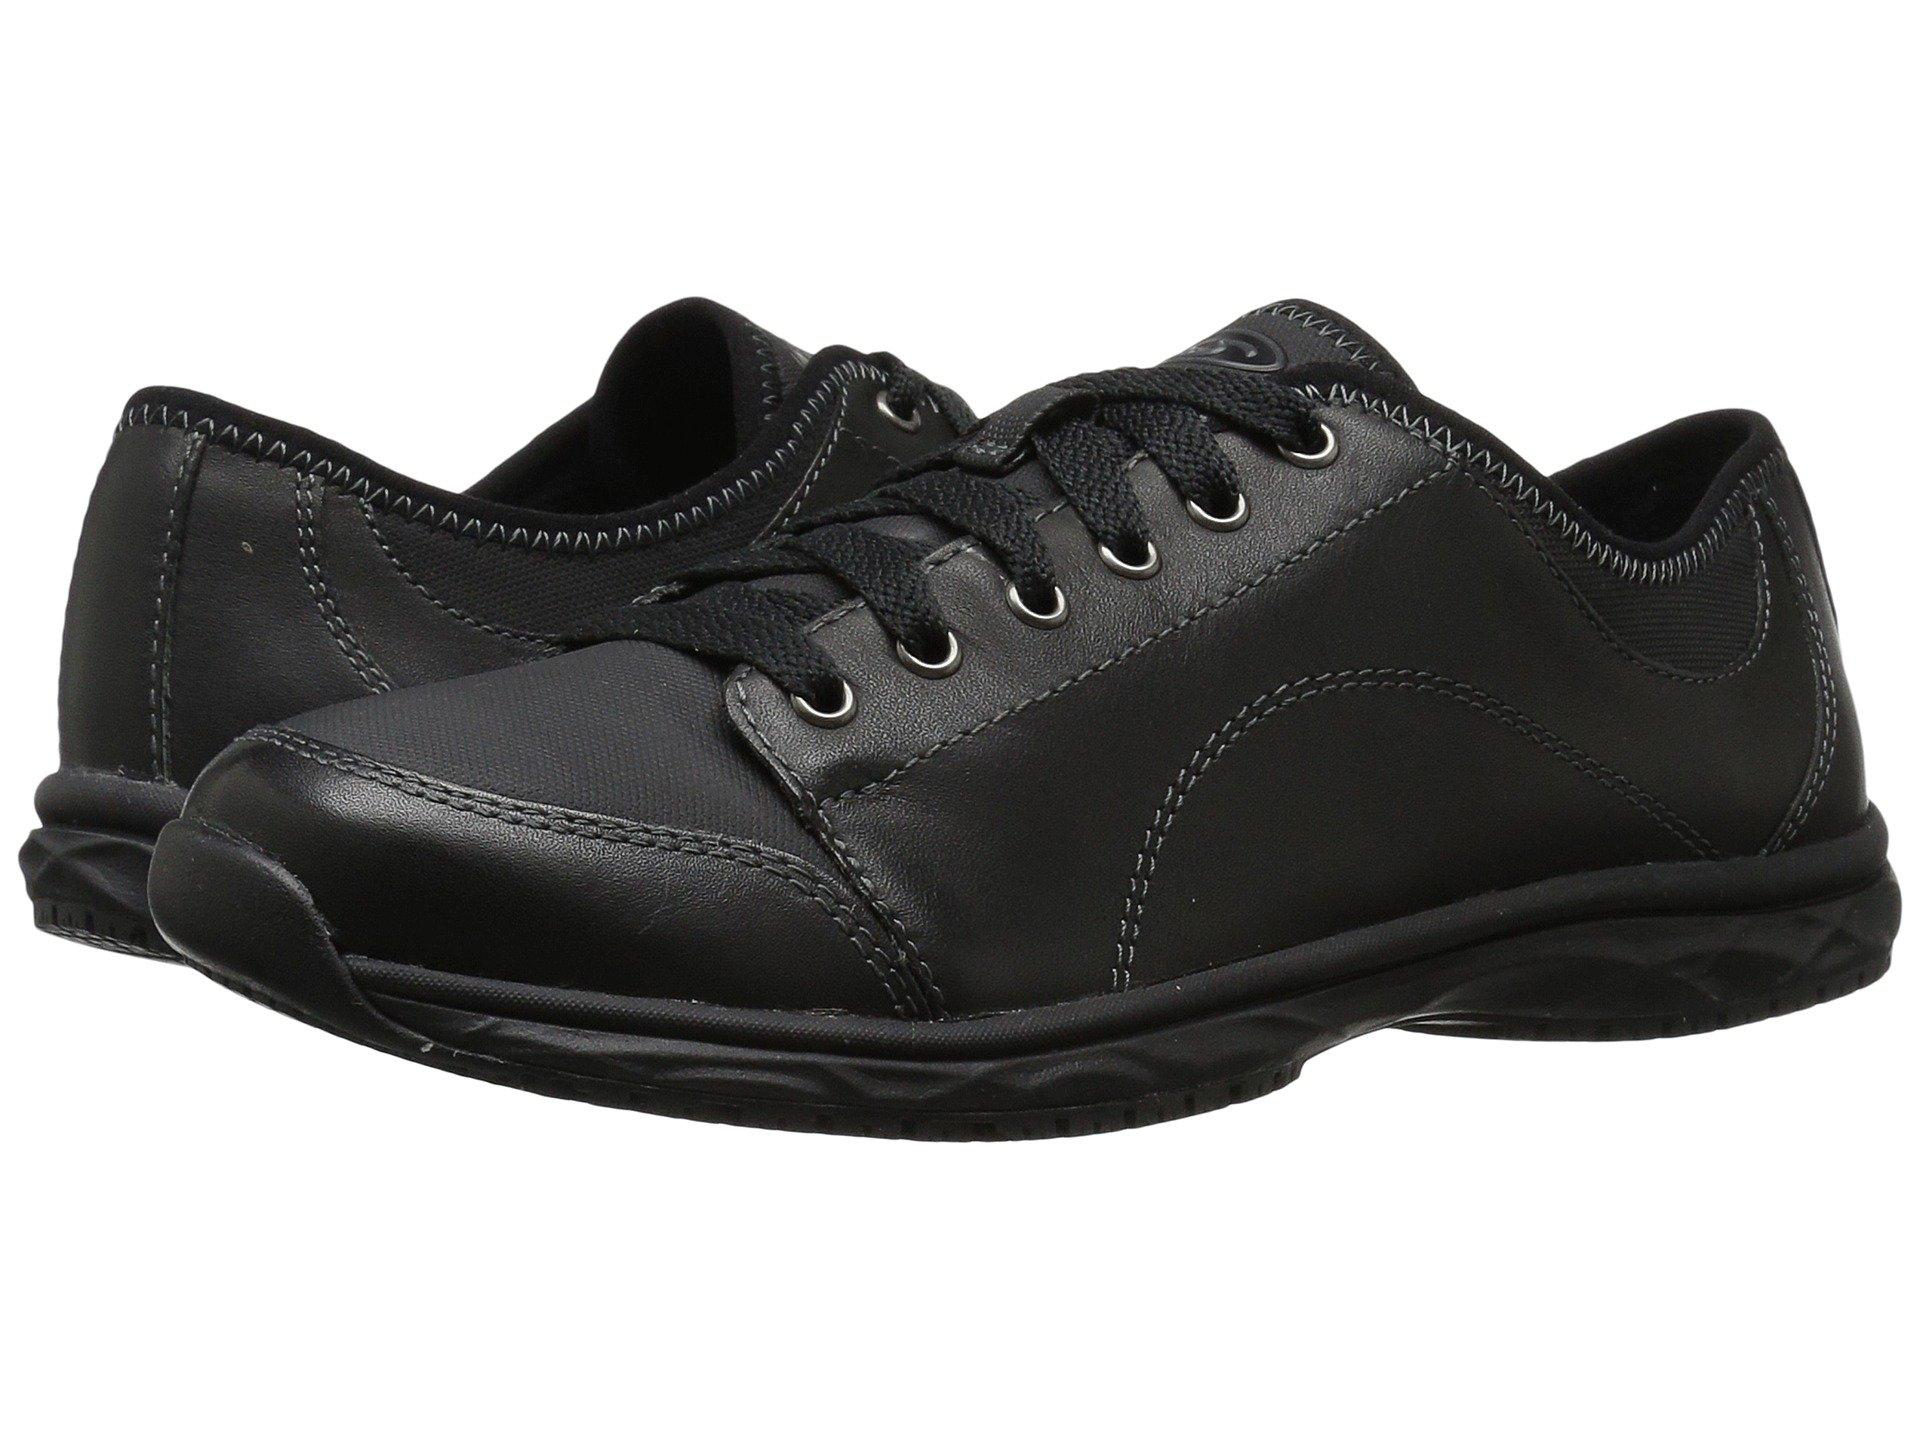 Brave Dr Scholl's Black Leather Work qxPfp